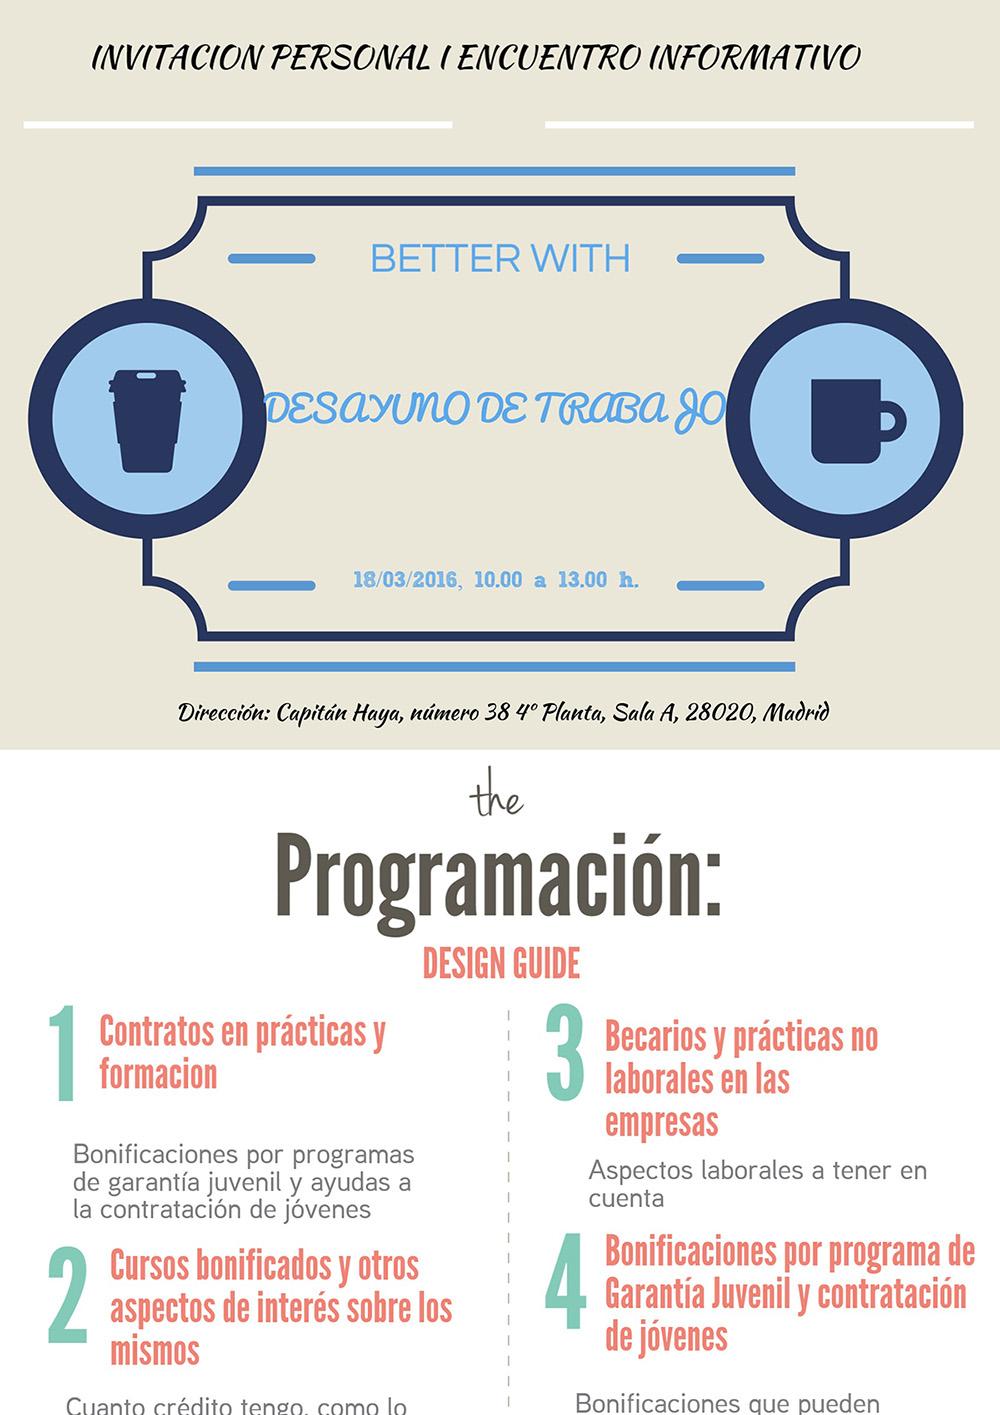 Invitacion I Encuentro Informativo